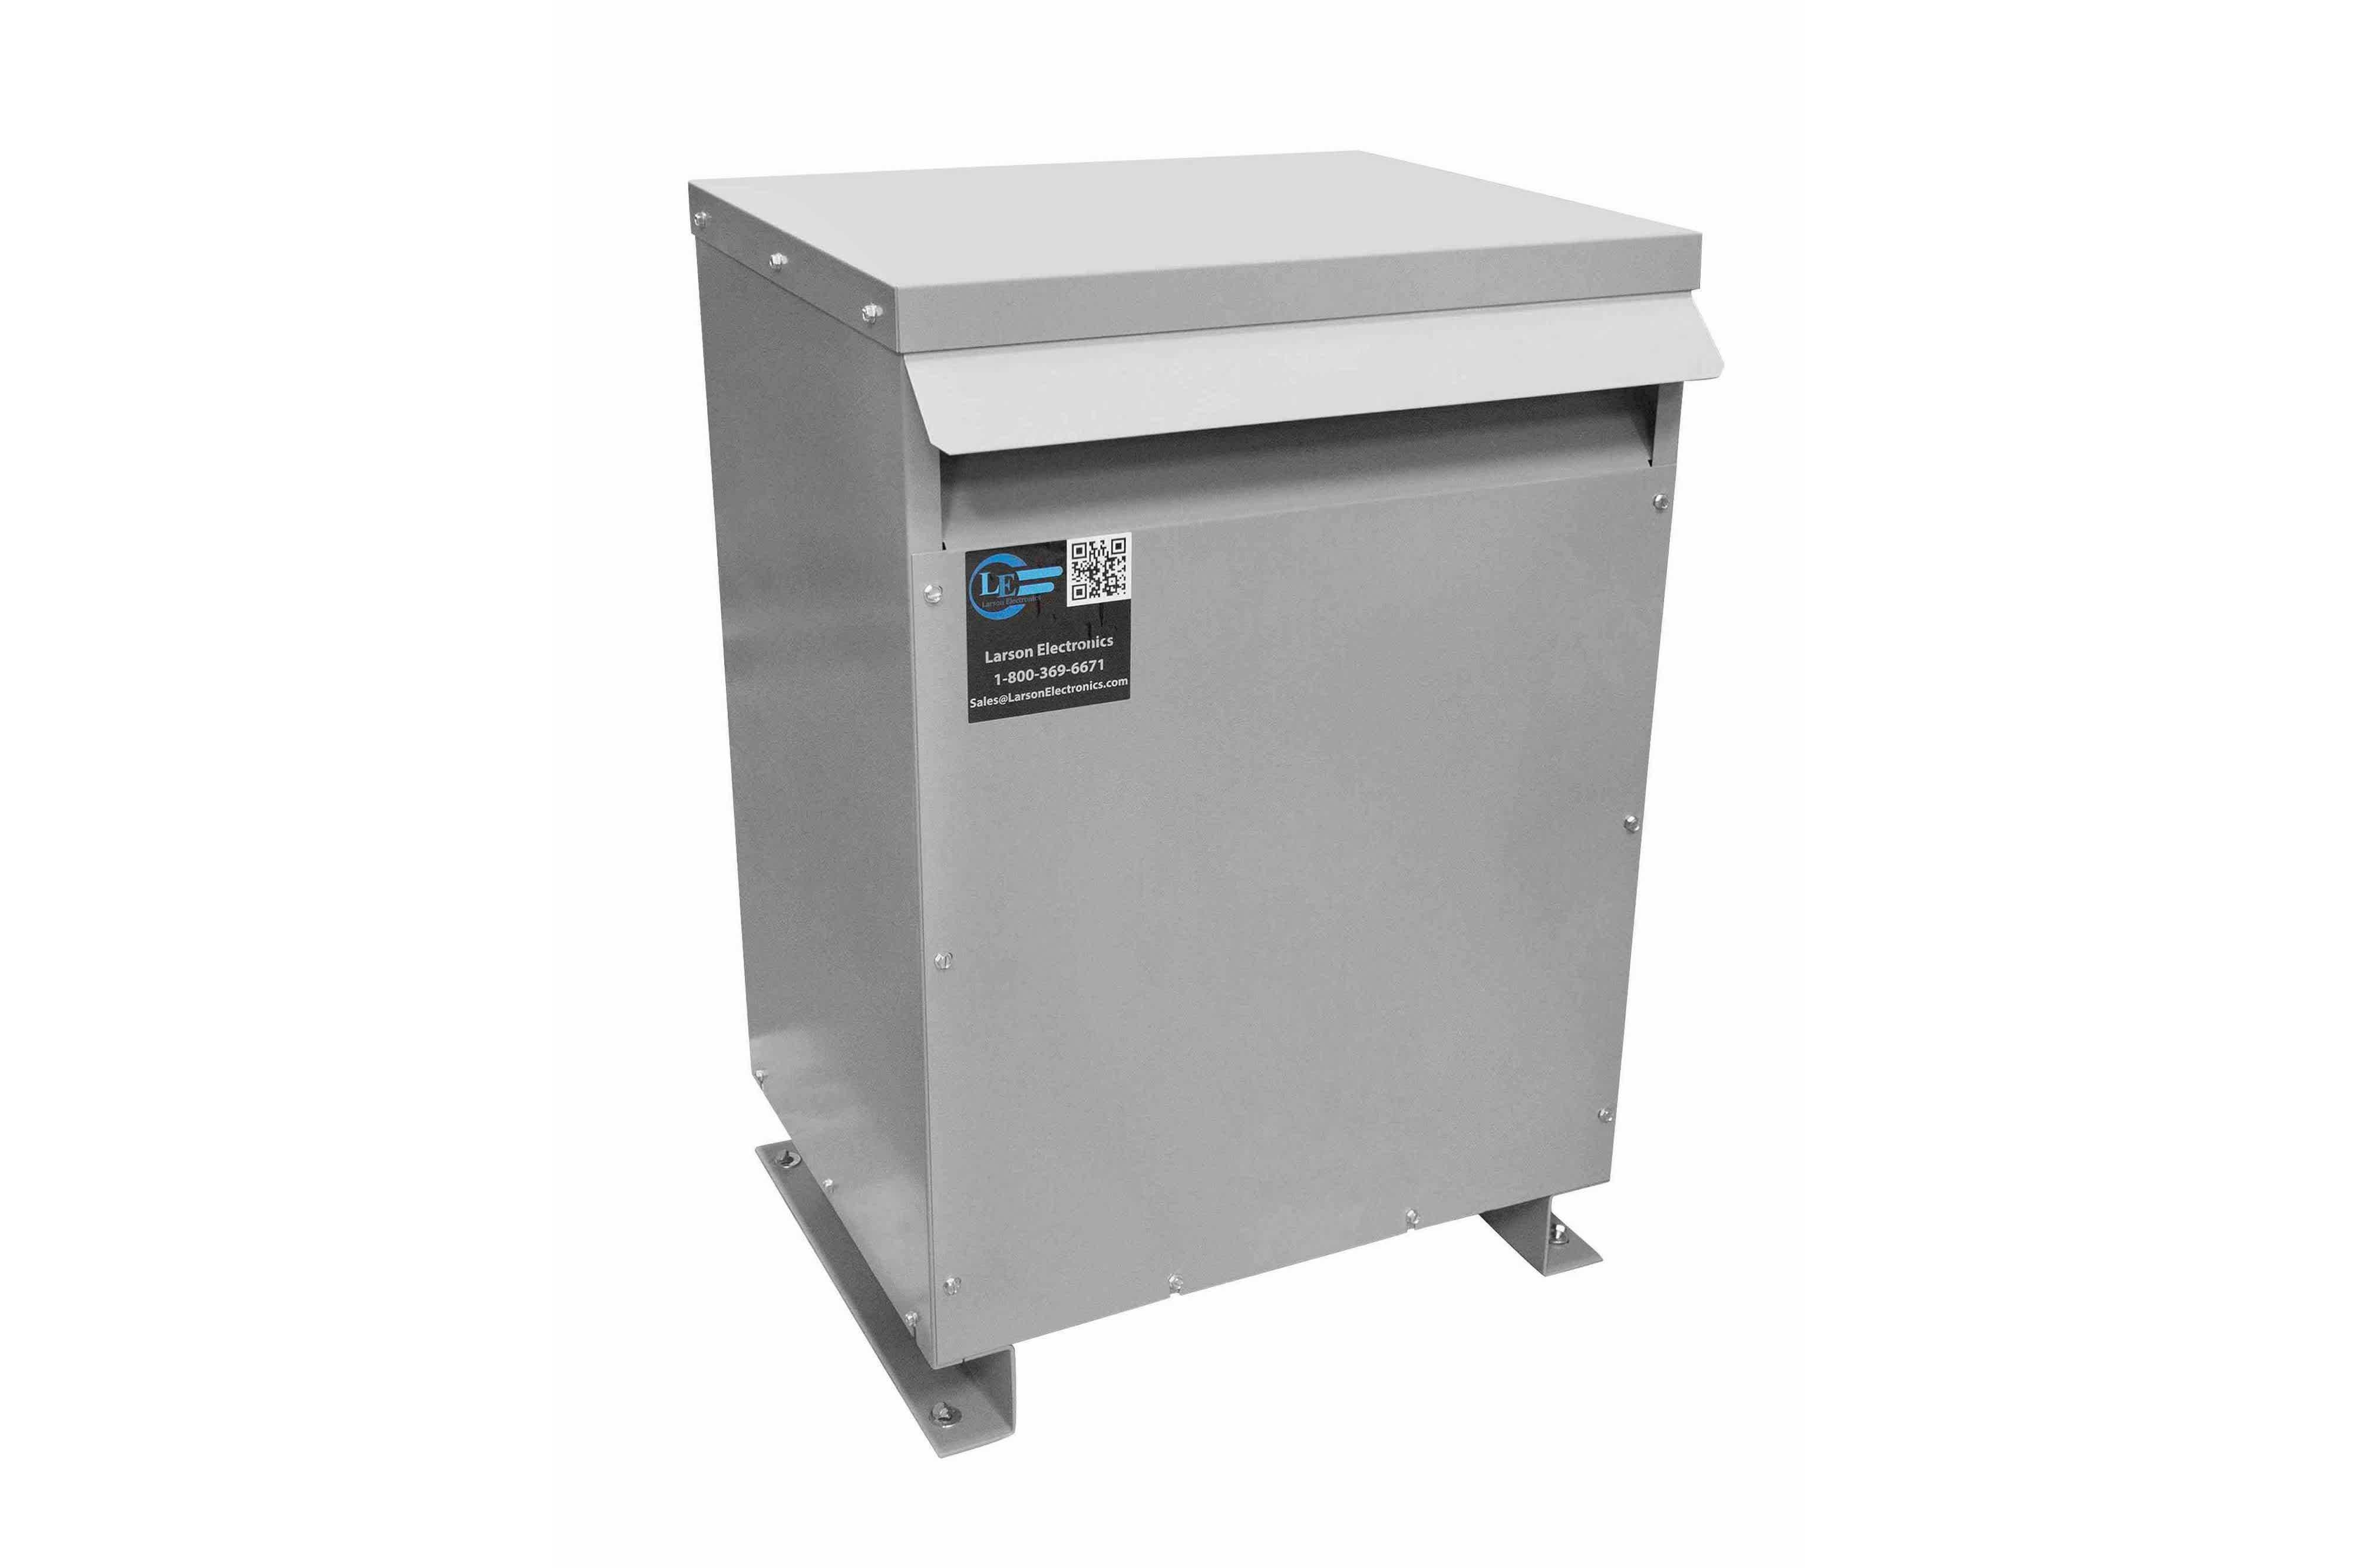 115 kVA 3PH Isolation Transformer, 480V Wye Primary, 380Y/220 Wye-N Secondary, N3R, Ventilated, 60 Hz